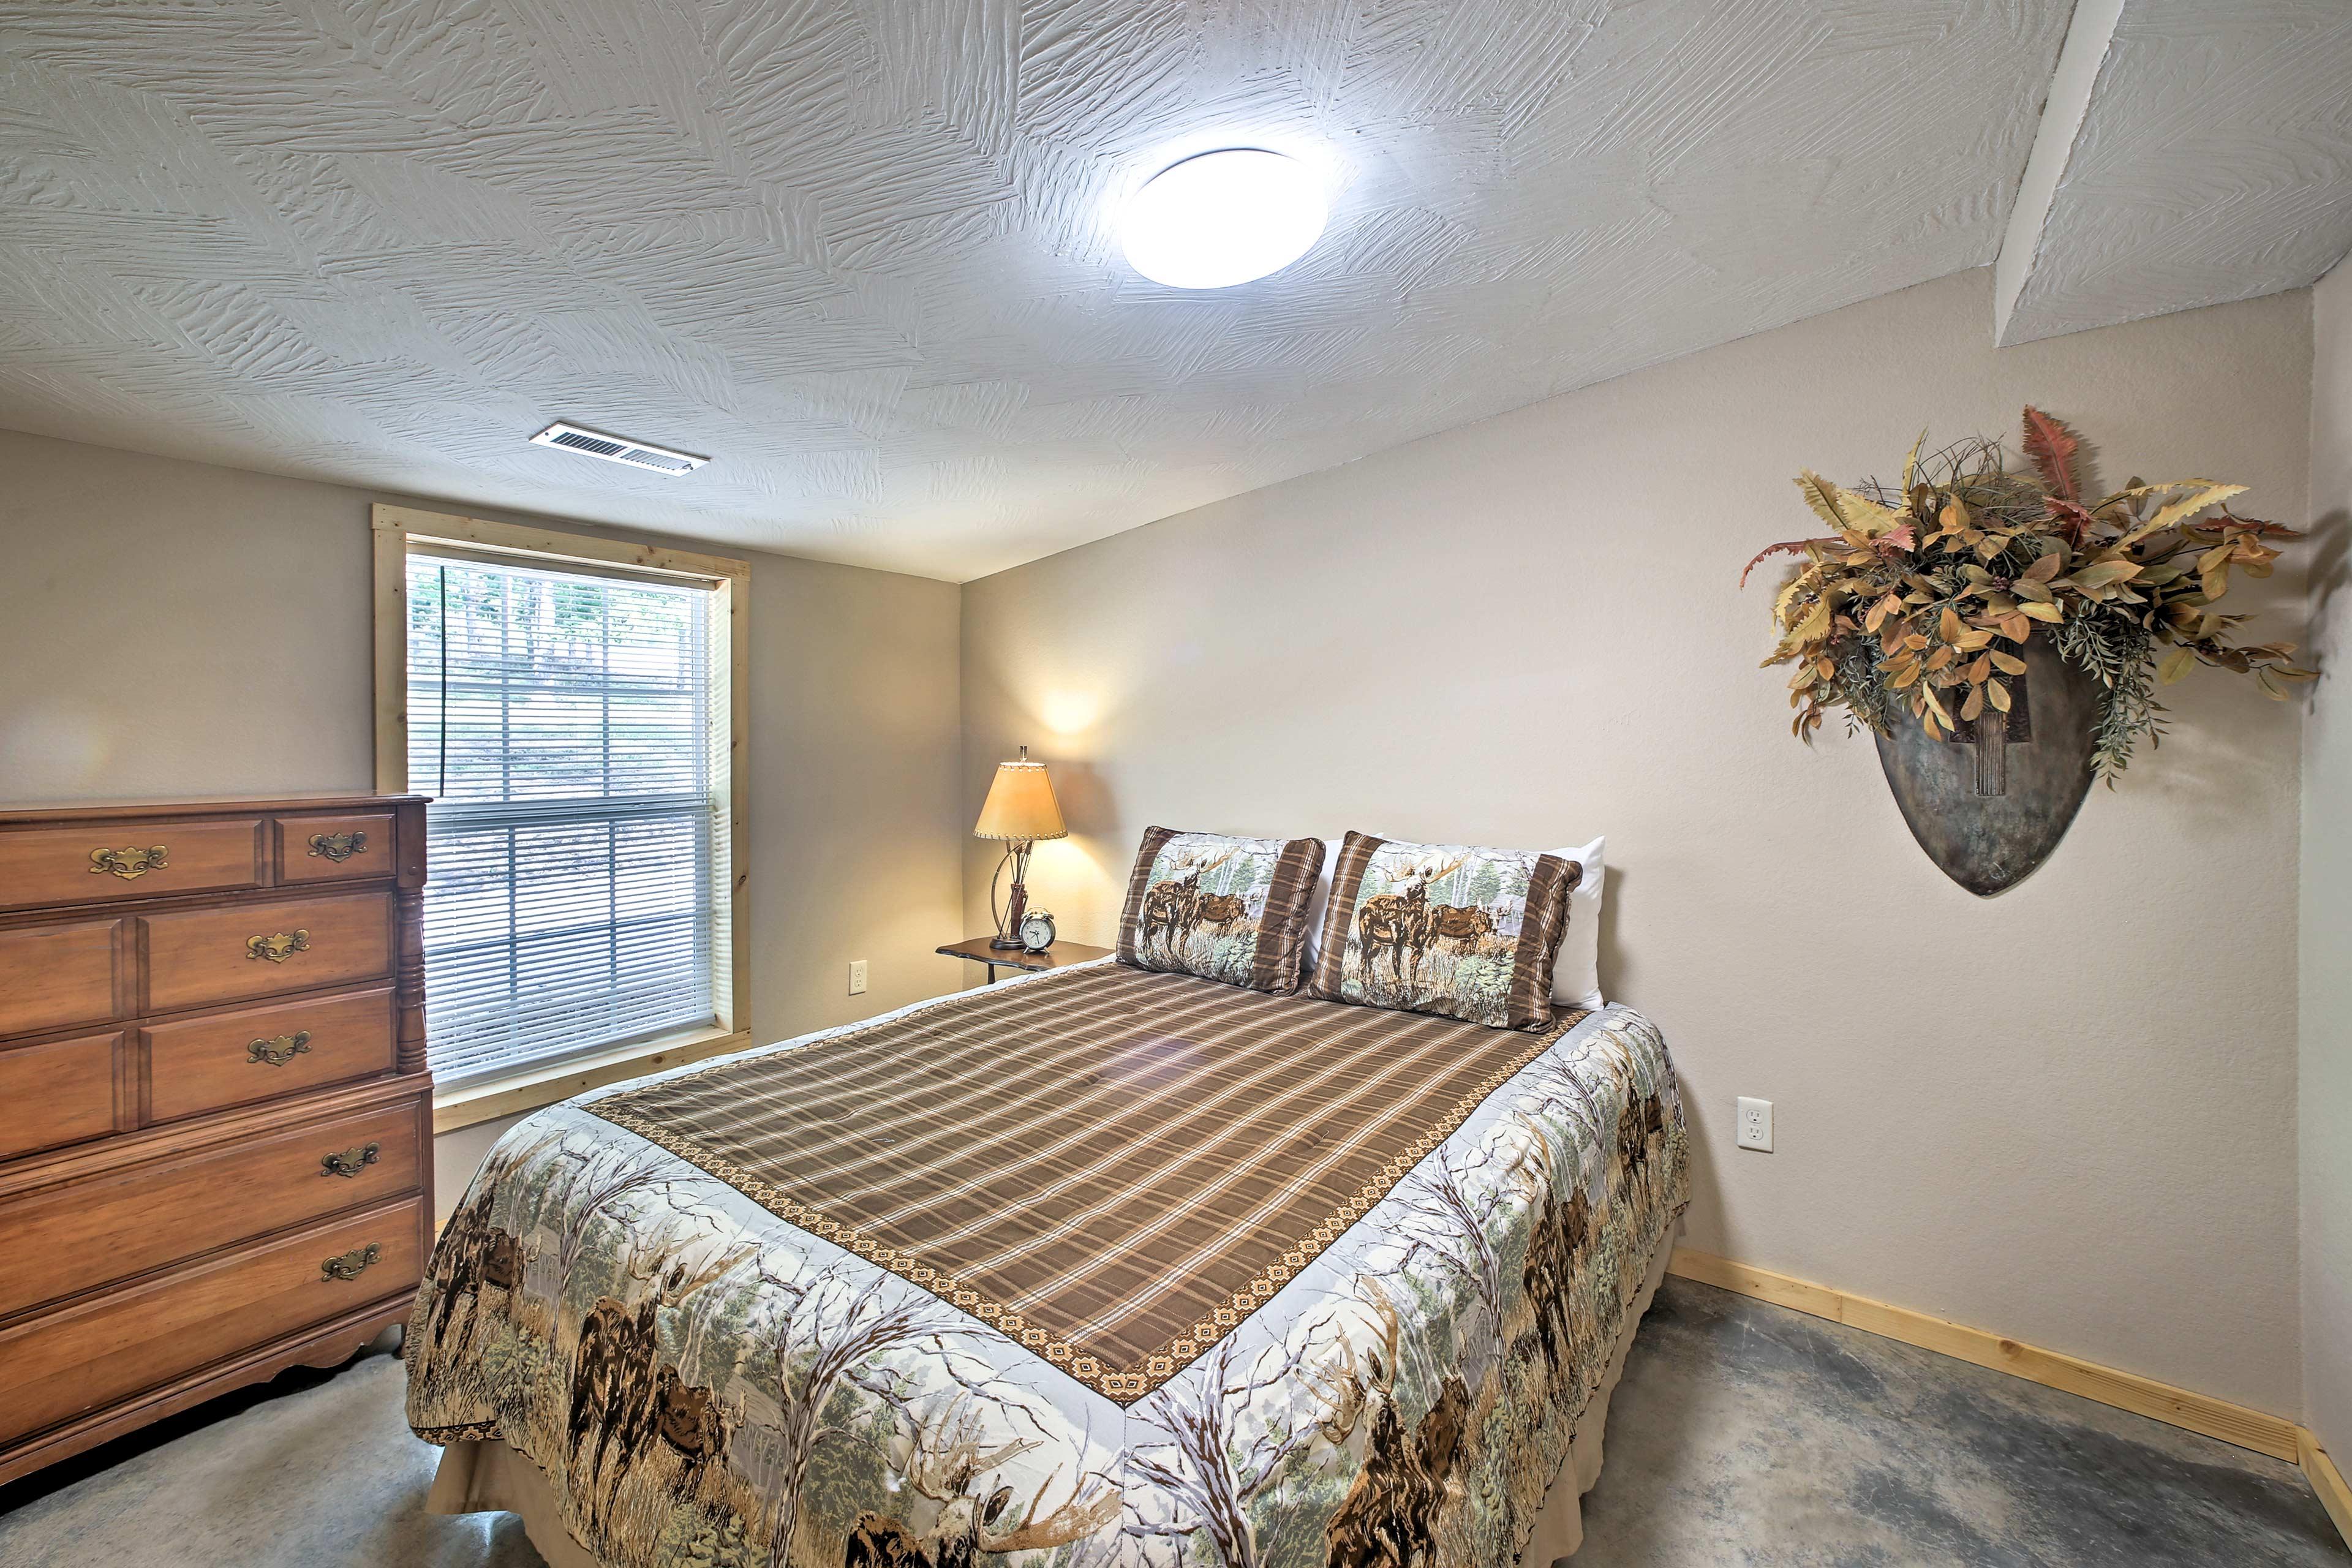 The final bedroom has a cloud-like queen bed!